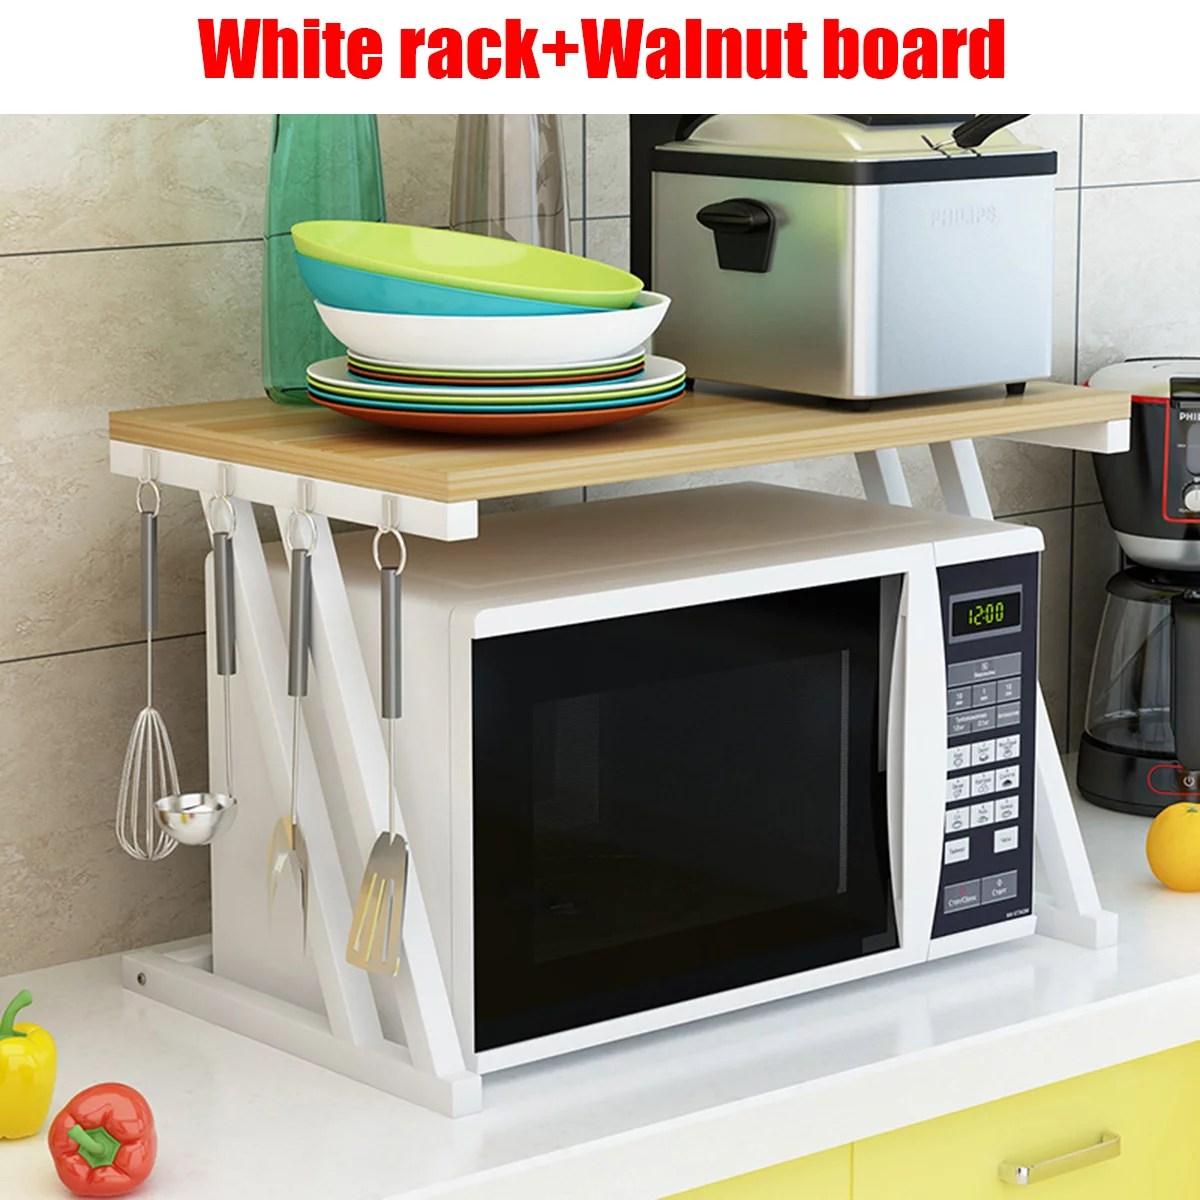 2 tier kitchen baker rack microwave oven stand storage cart workstation shelf